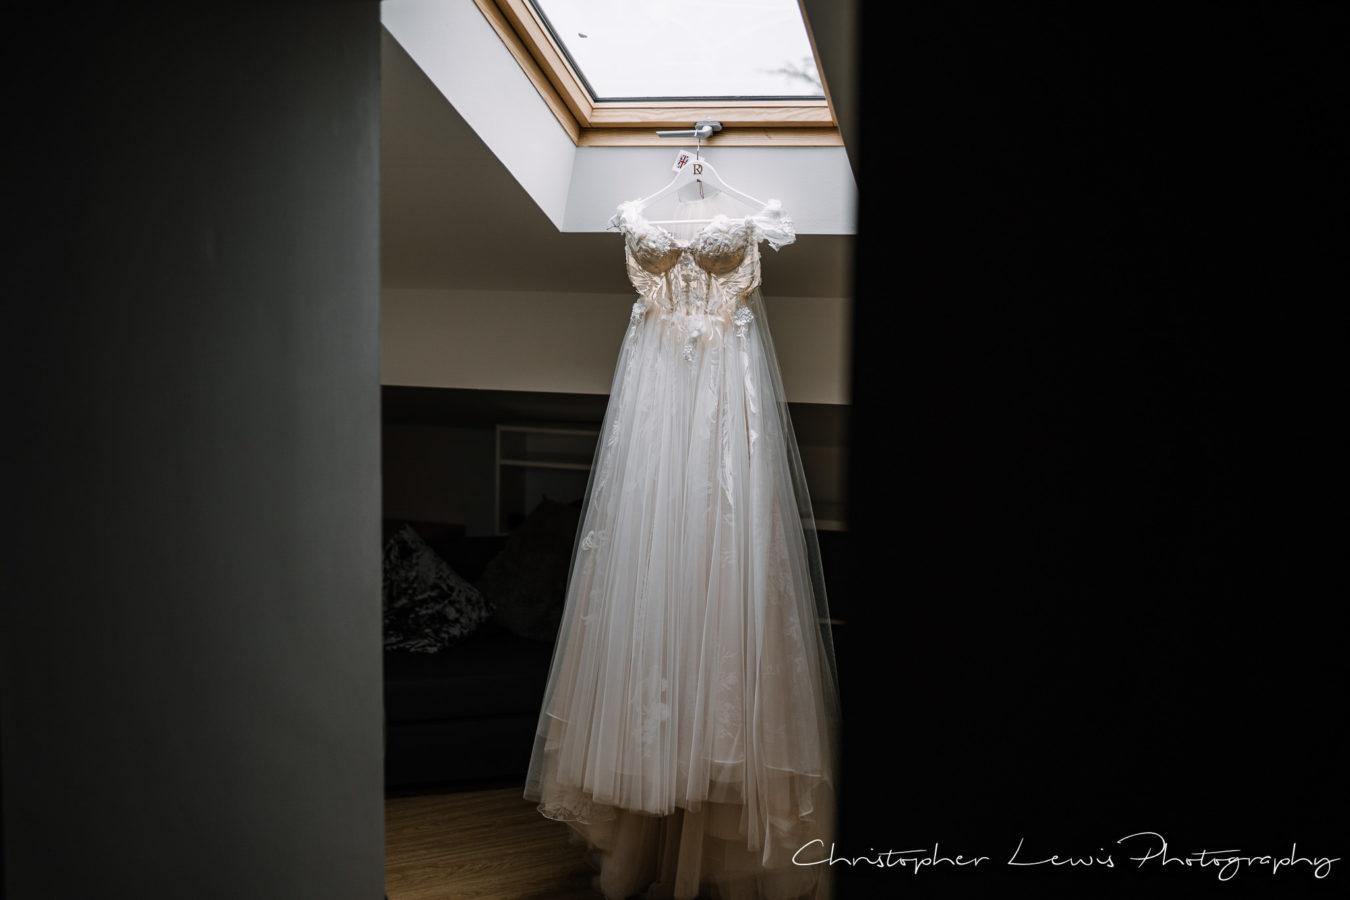 Mitton-Hall-Wedding 3